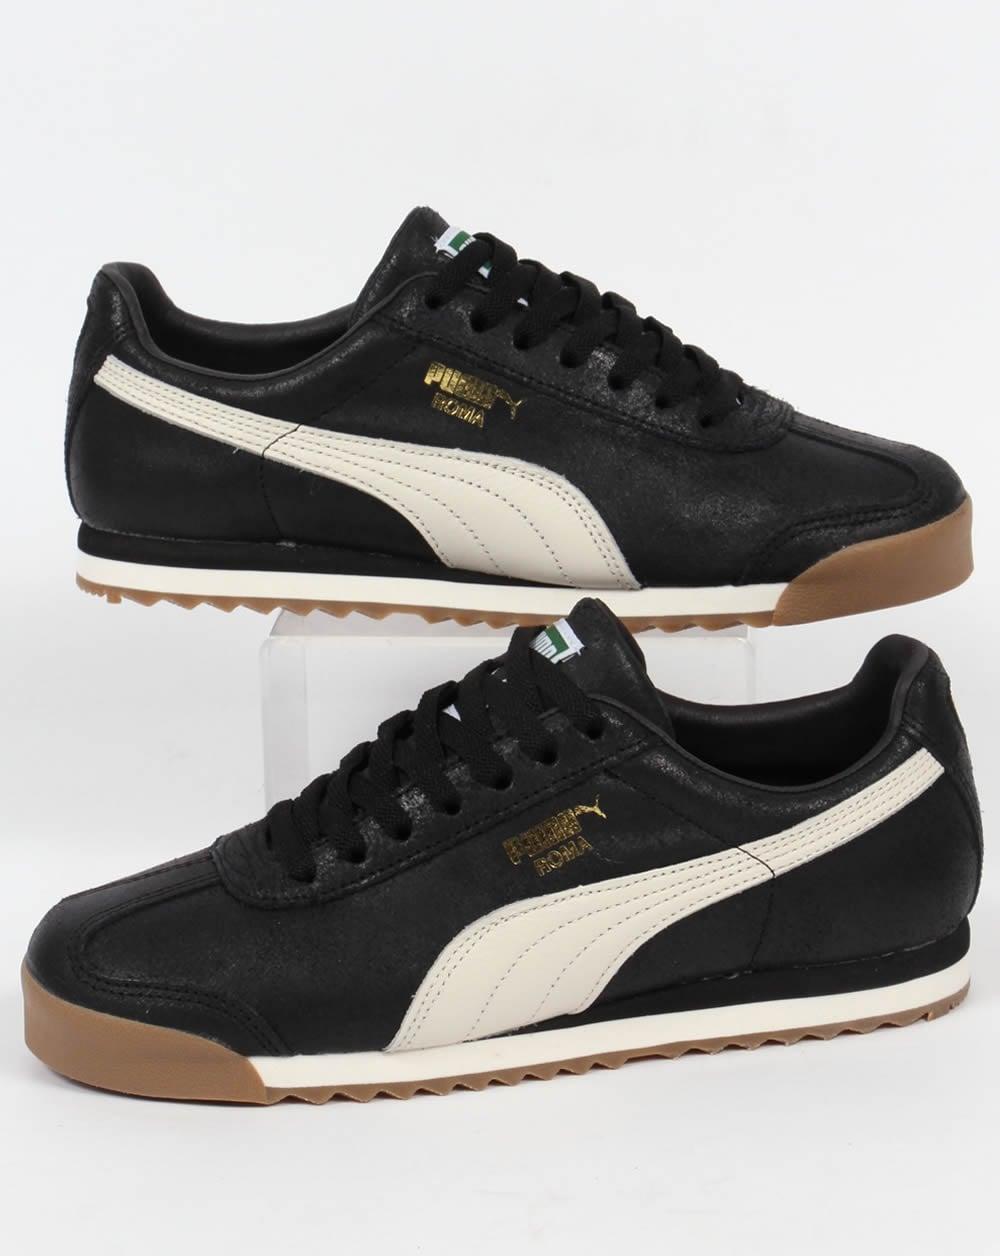 mens black leather puma trainers